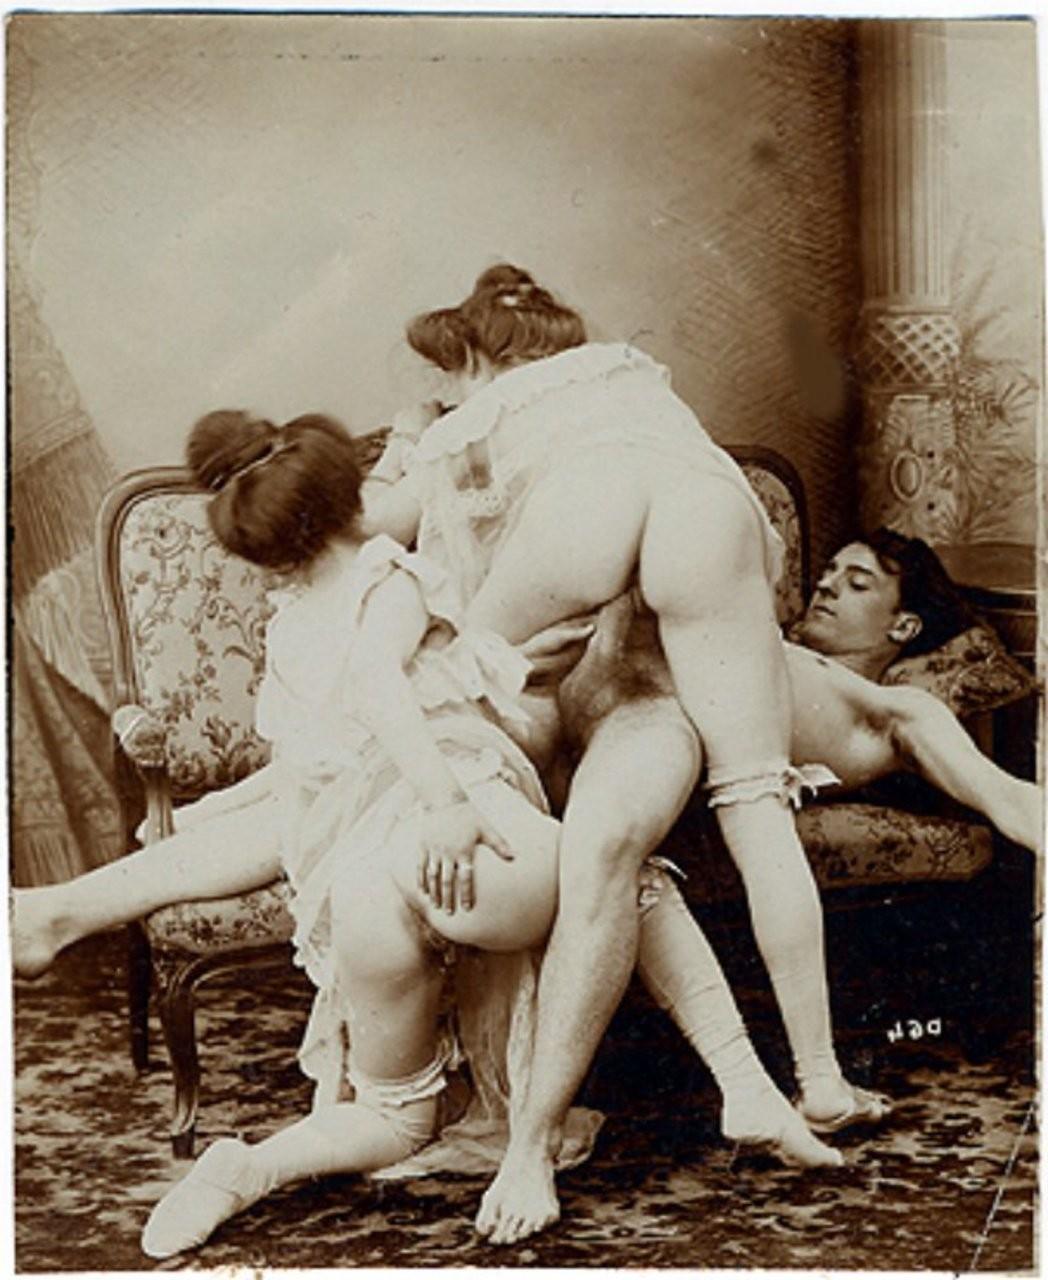 erbe kathryn nude pic – Amateur